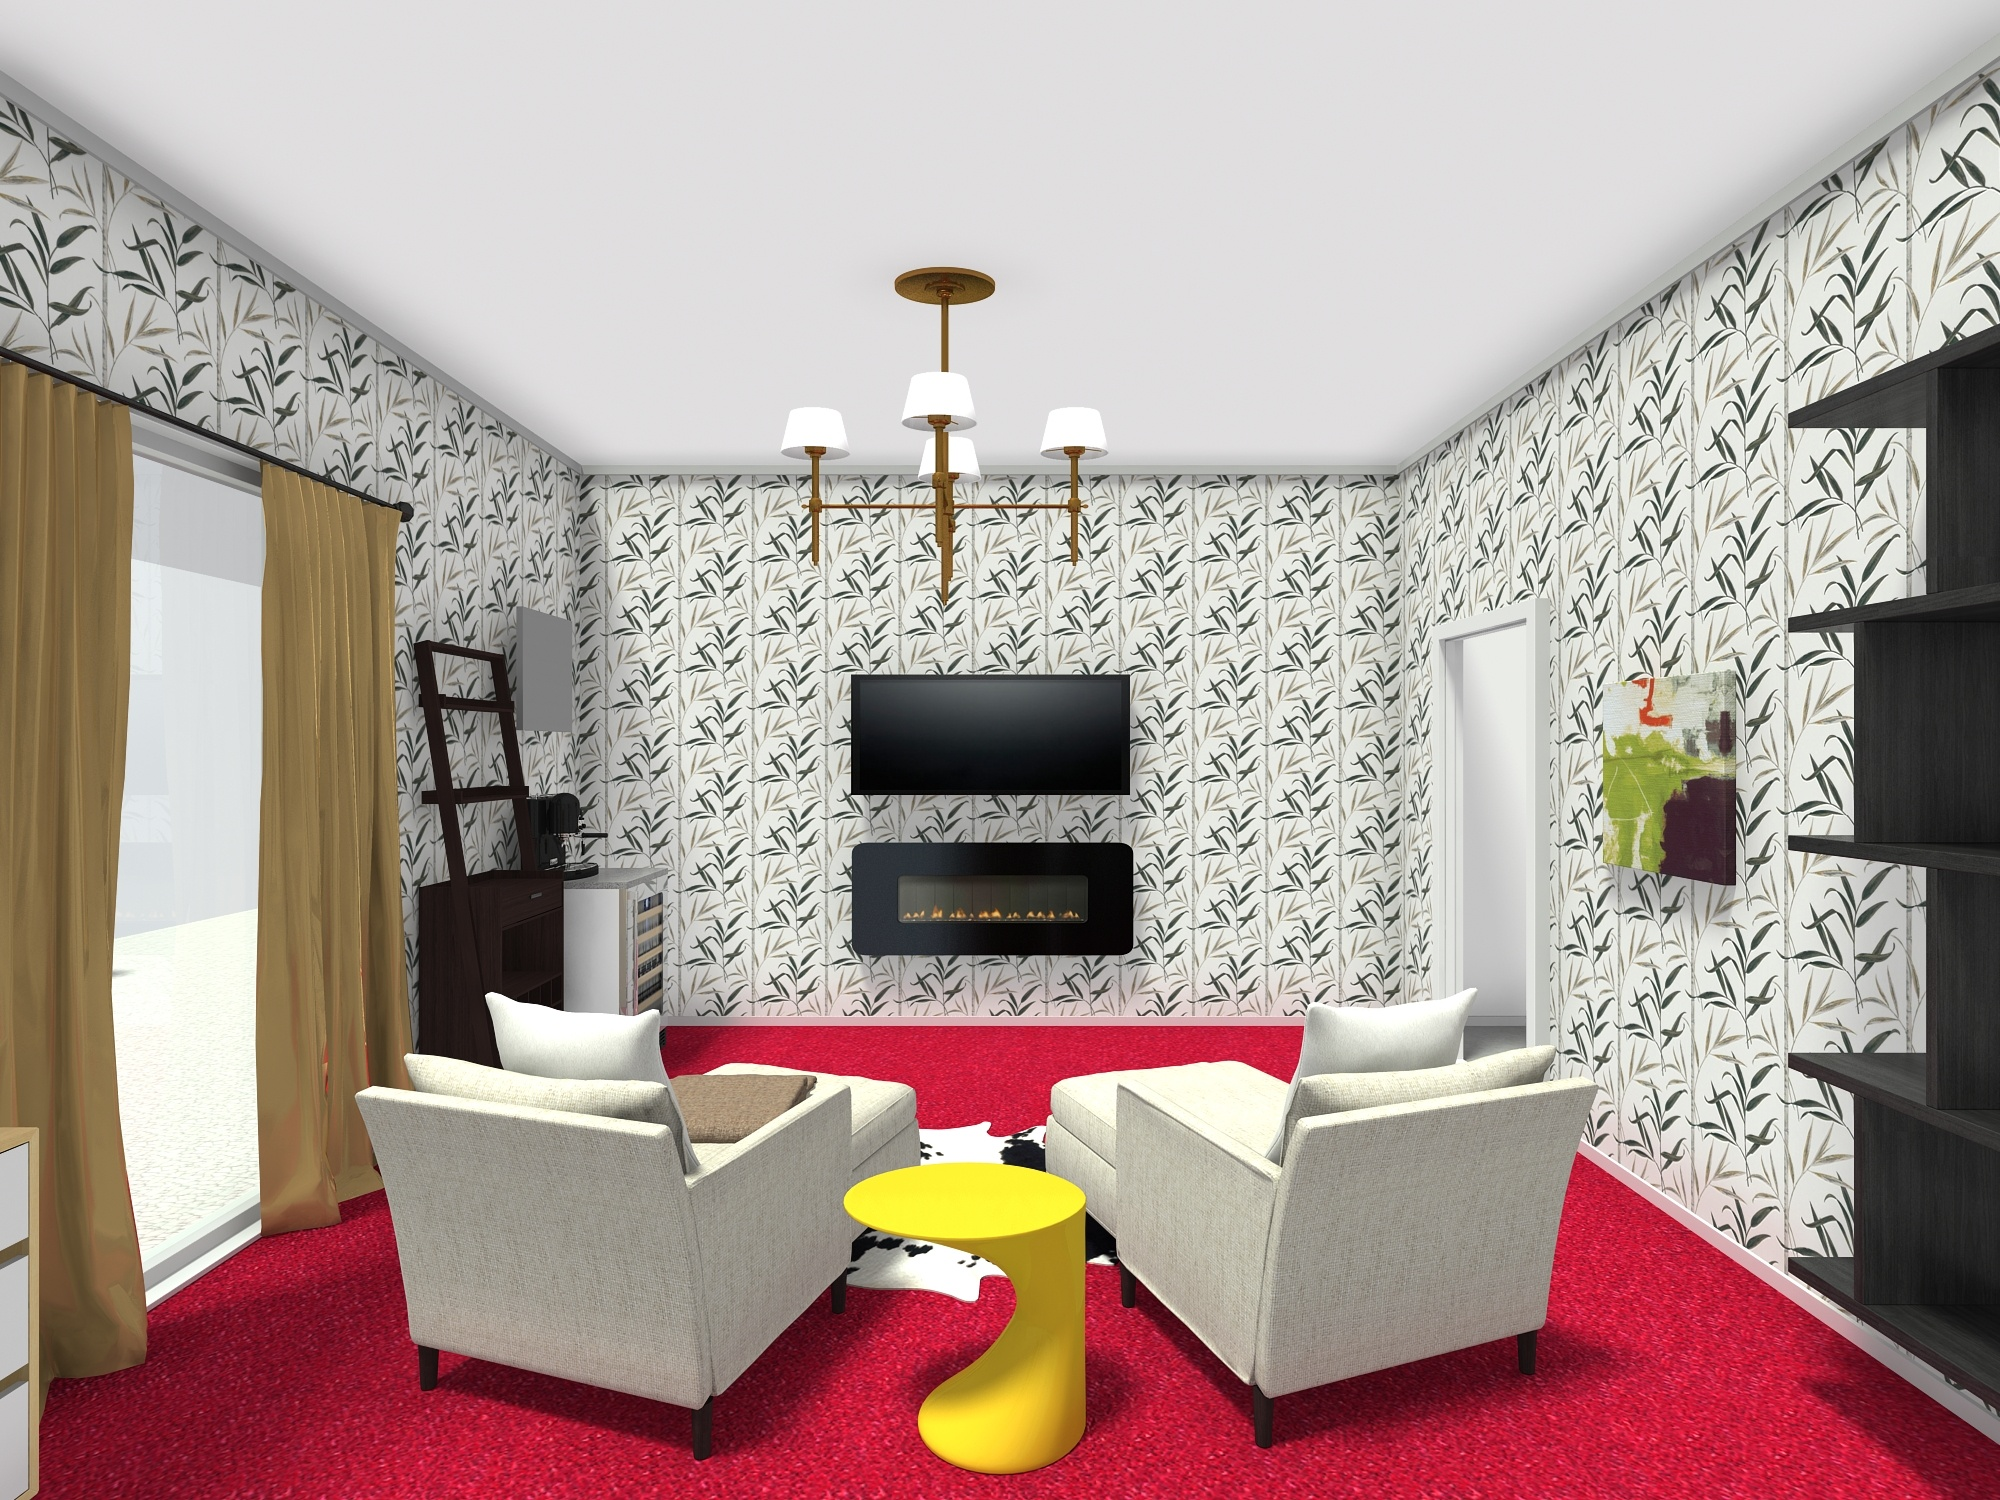 thewlis house - 3D Photo.jpg